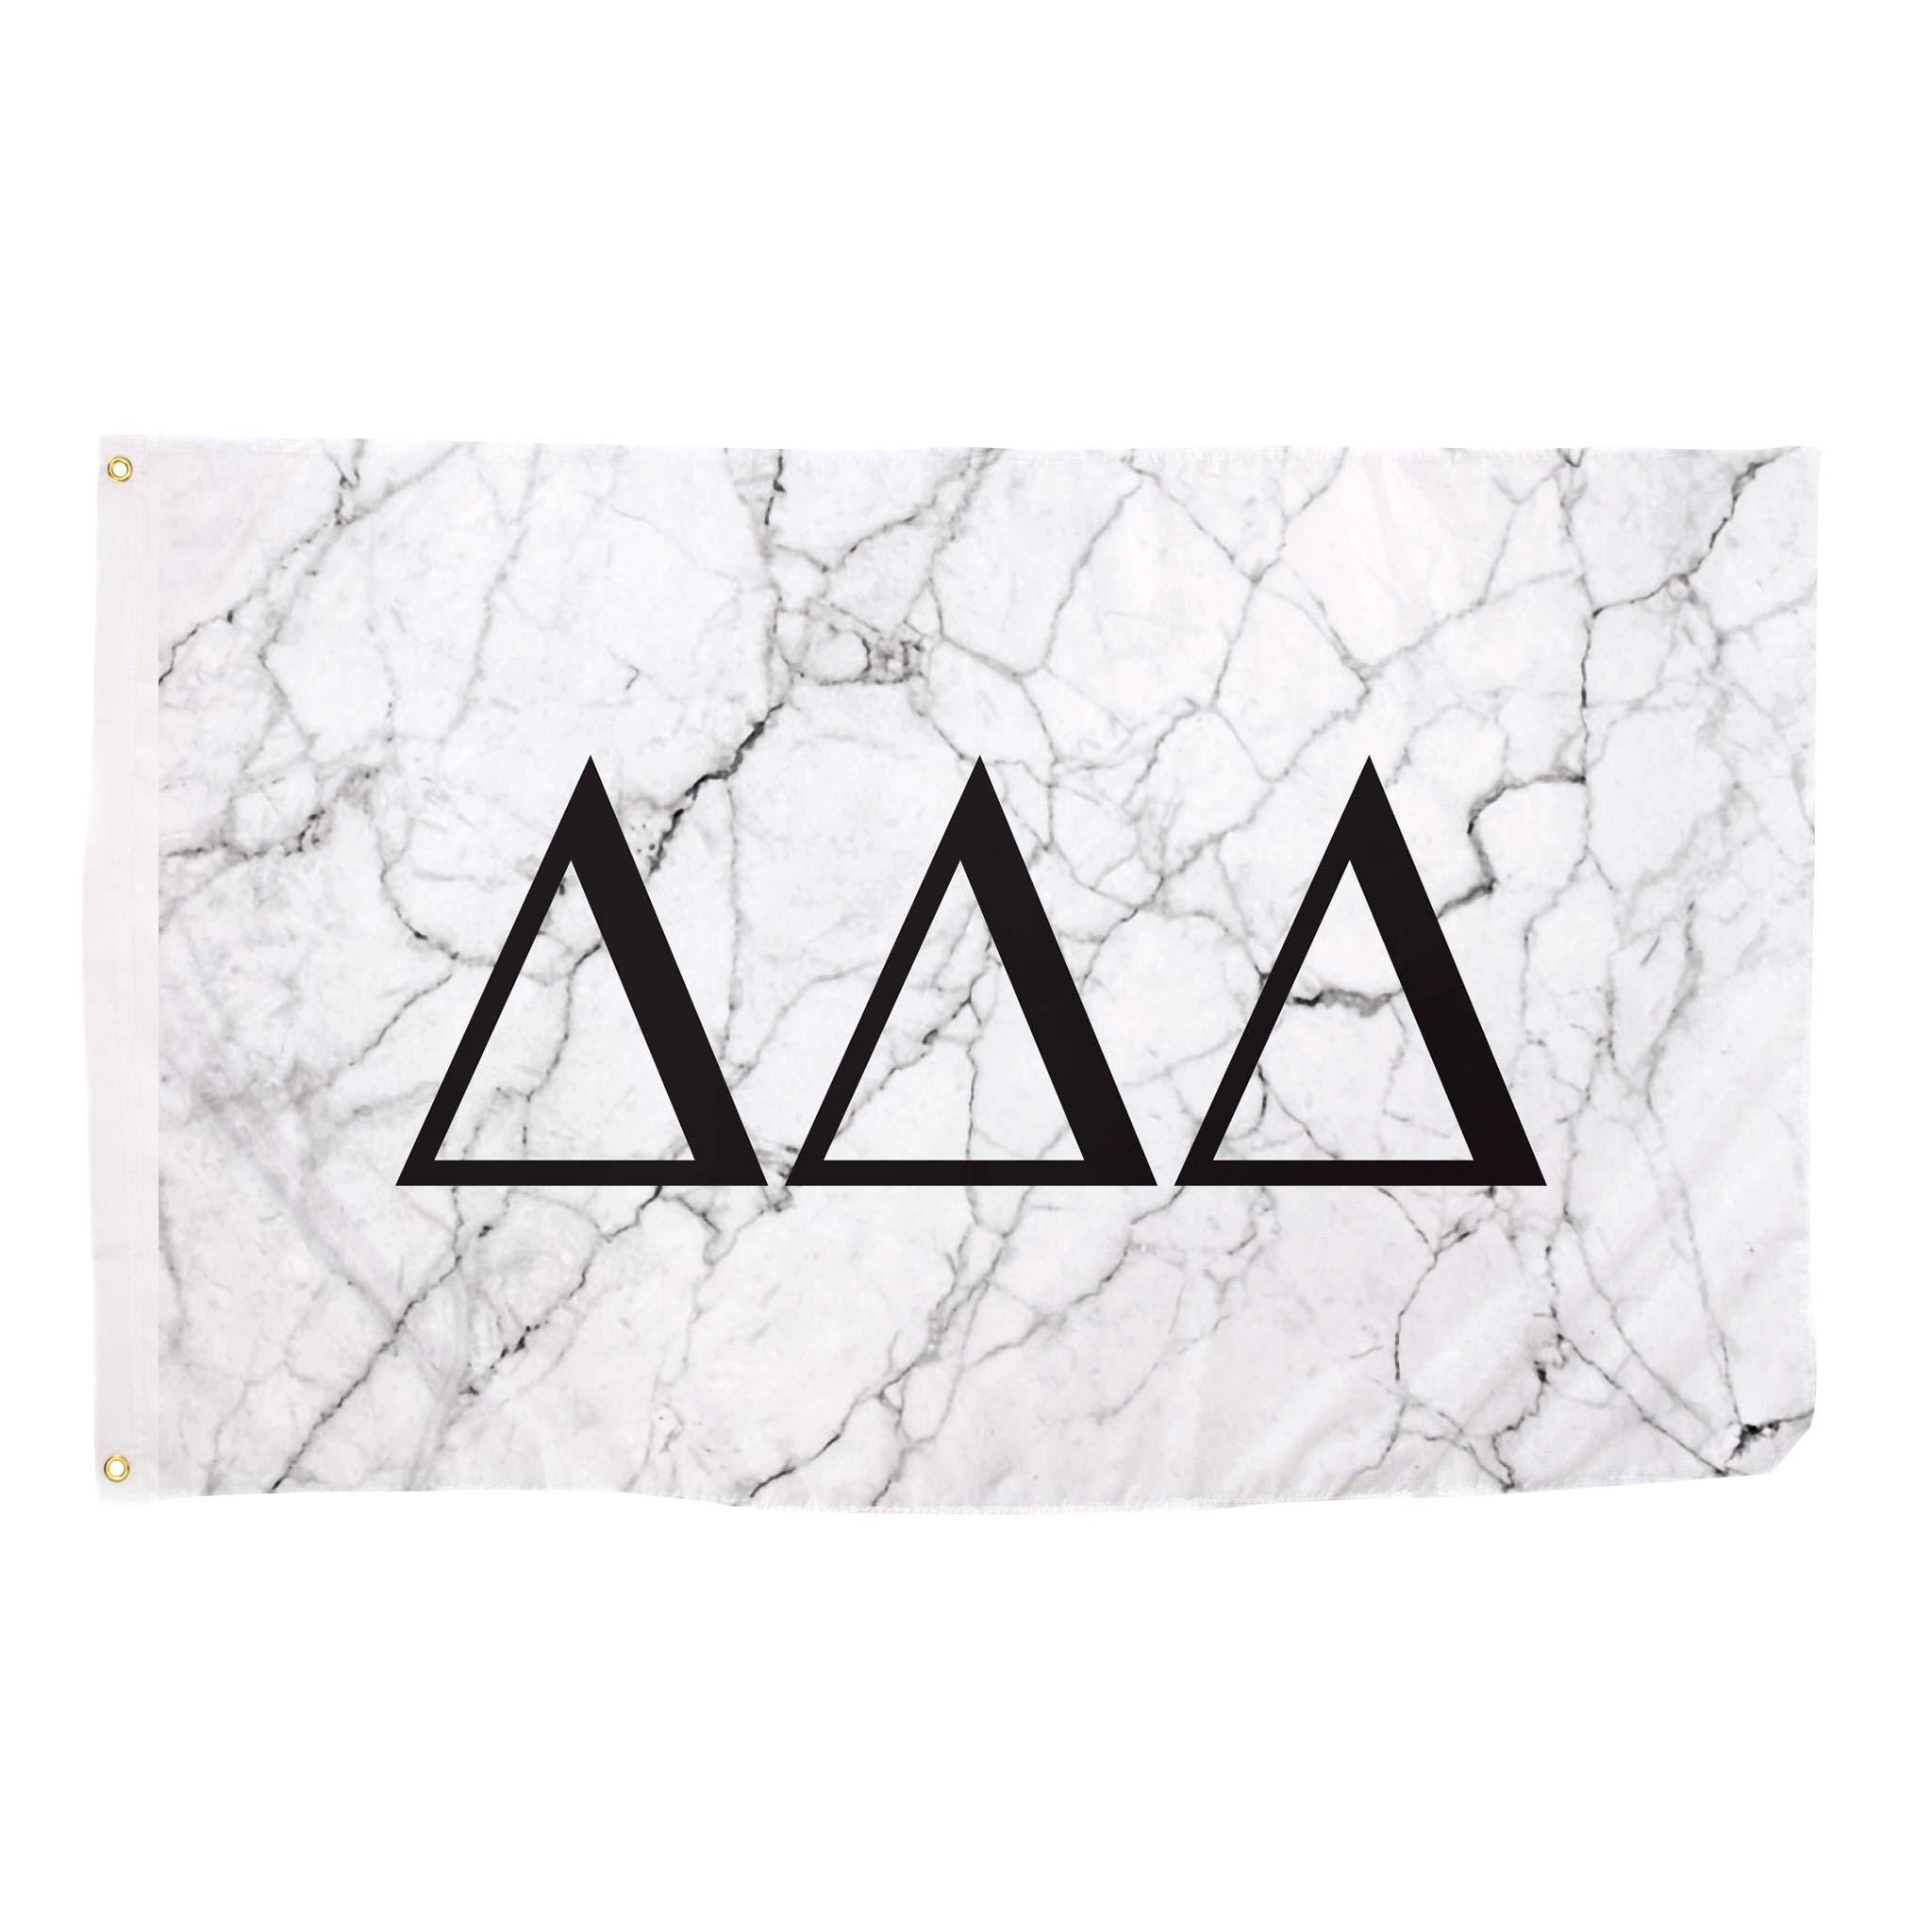 Delta Delta Delta Tri Delta Light Marble Sorority Letter Flag Banner 3 x 5 Sign Decor